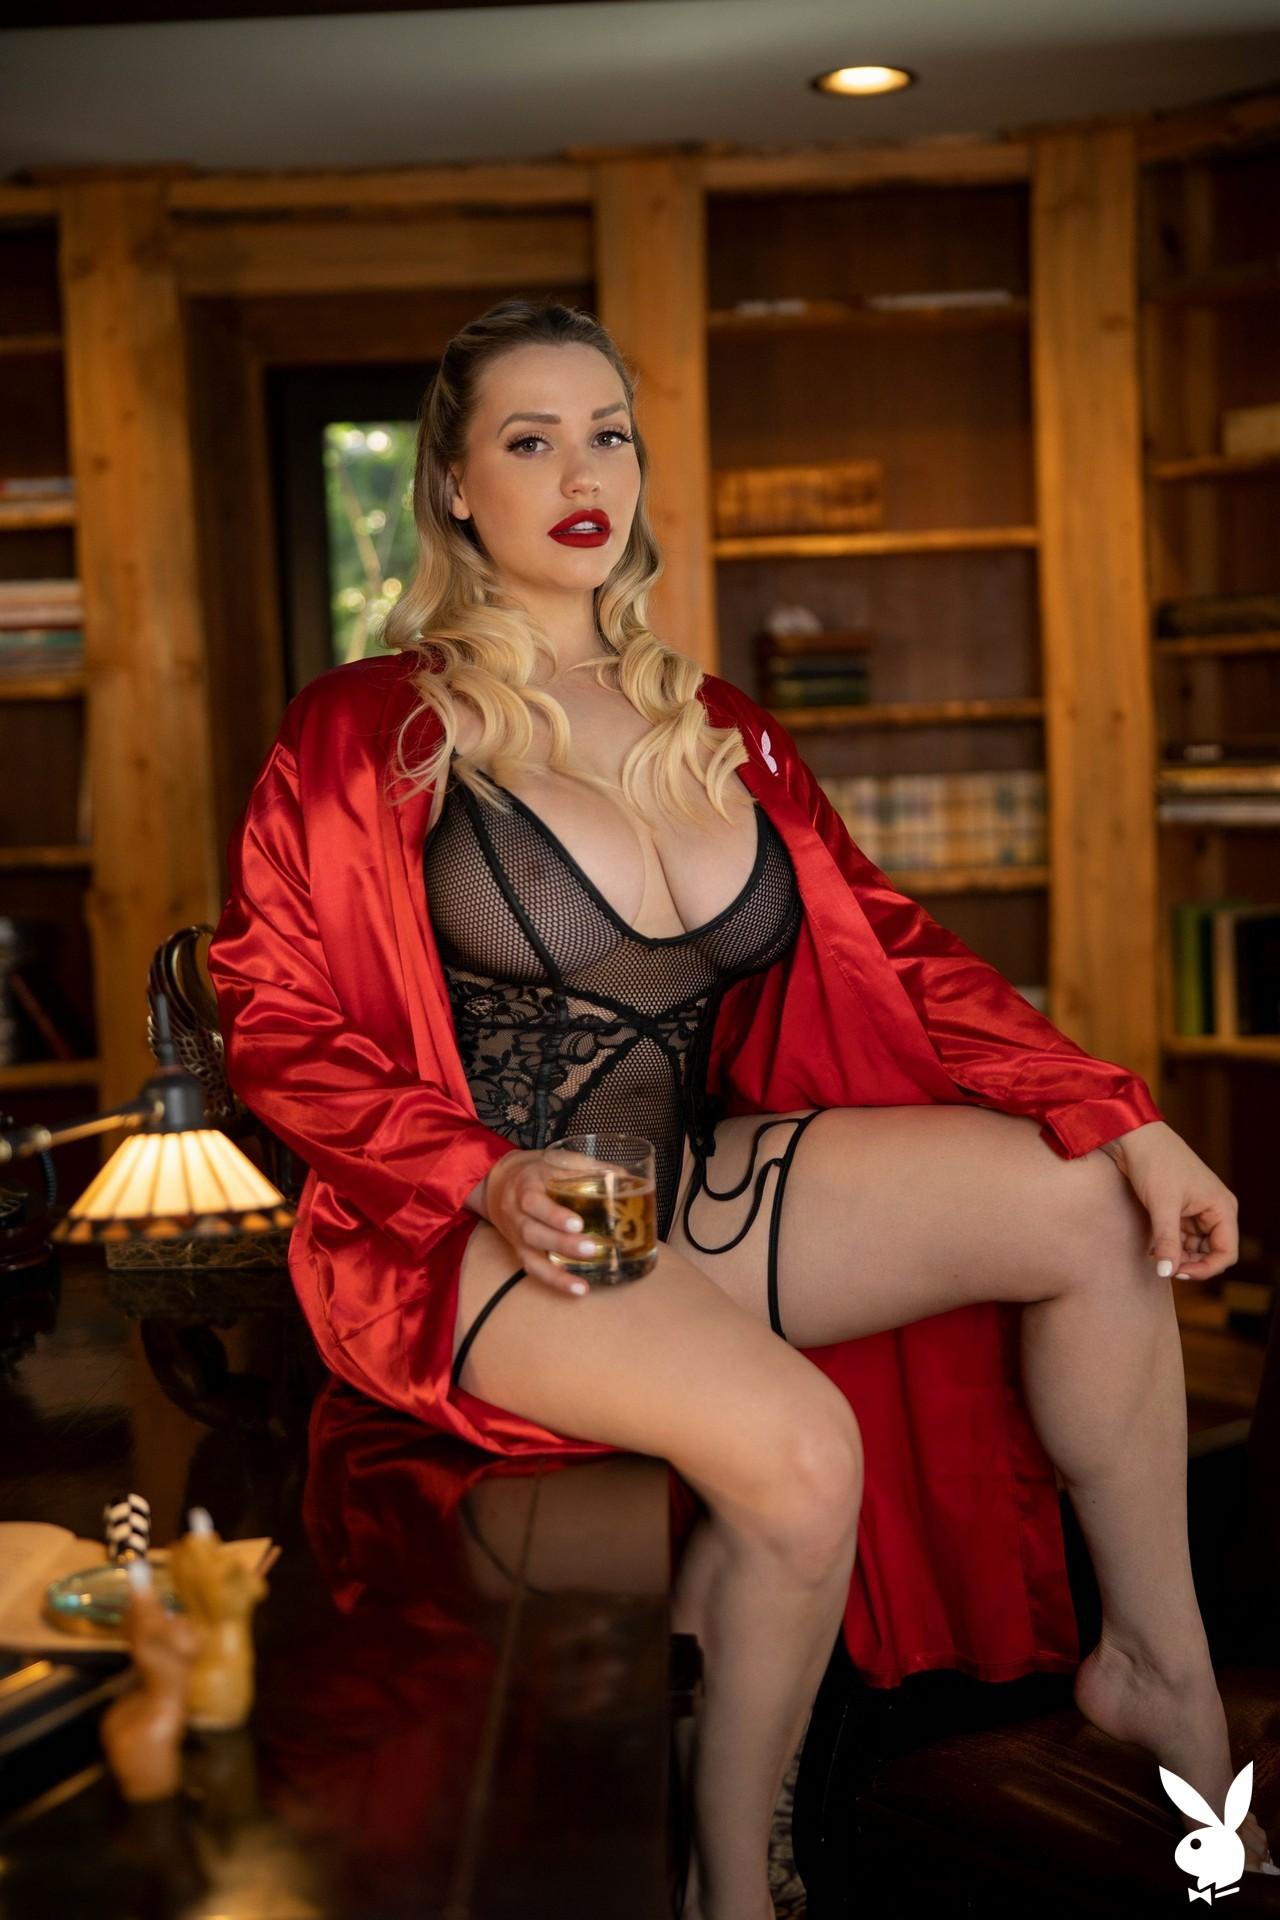 Mia Malkova In Off The Clock Playboy Plus (4)